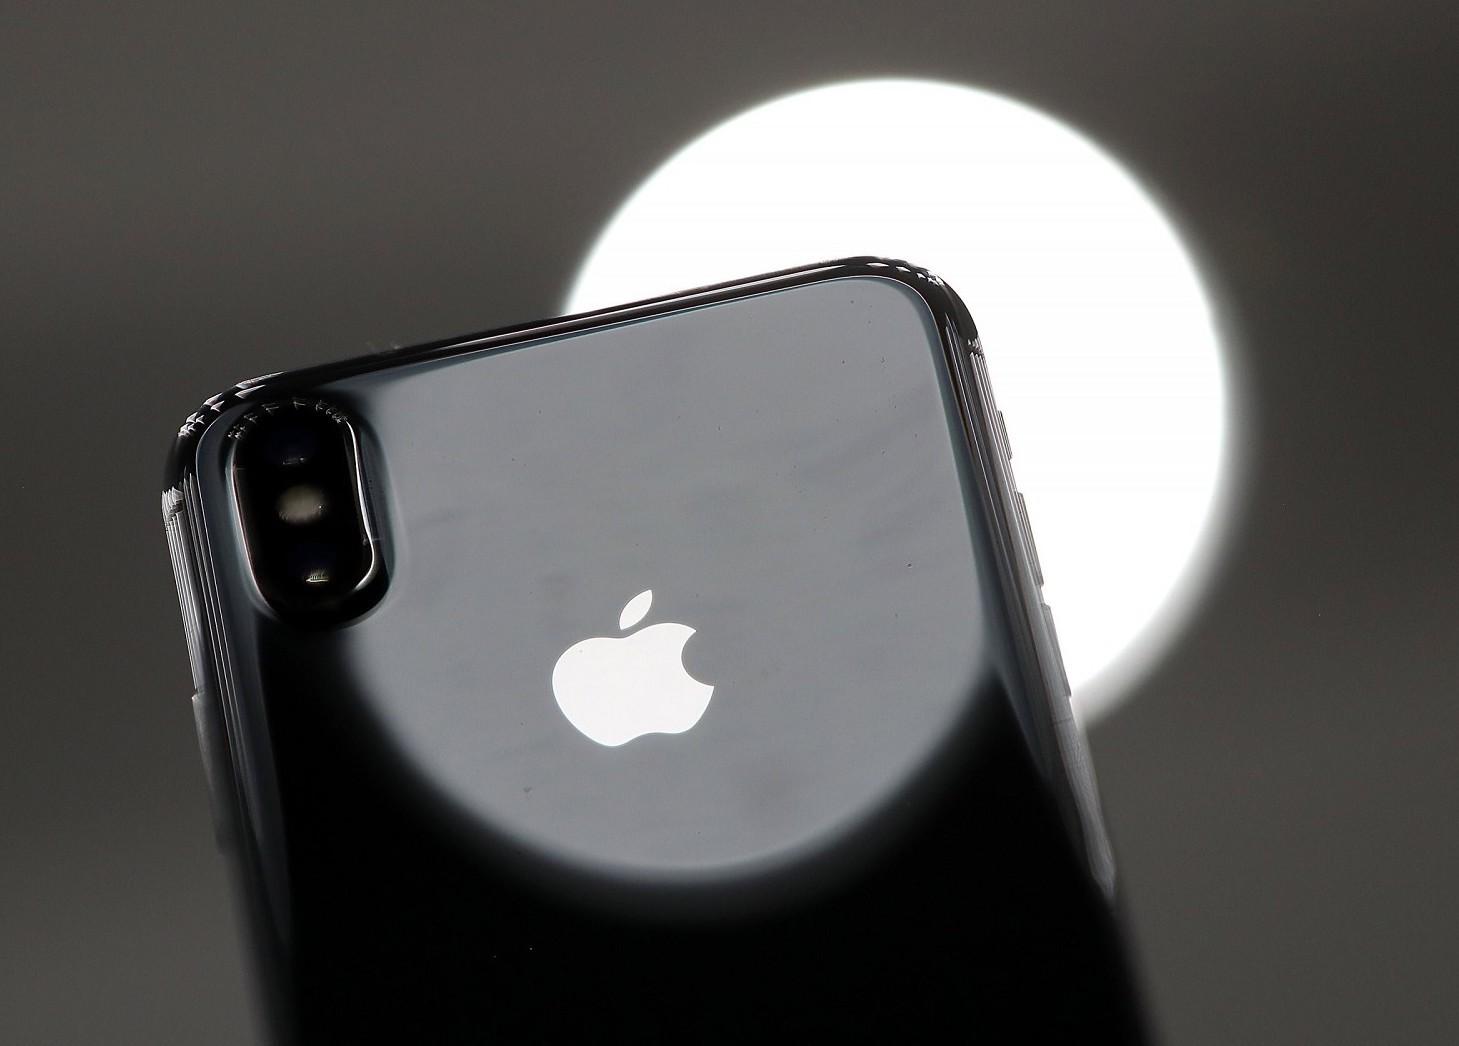 iPhone X, iPhone 8 Plus, iPhone 8: prezz